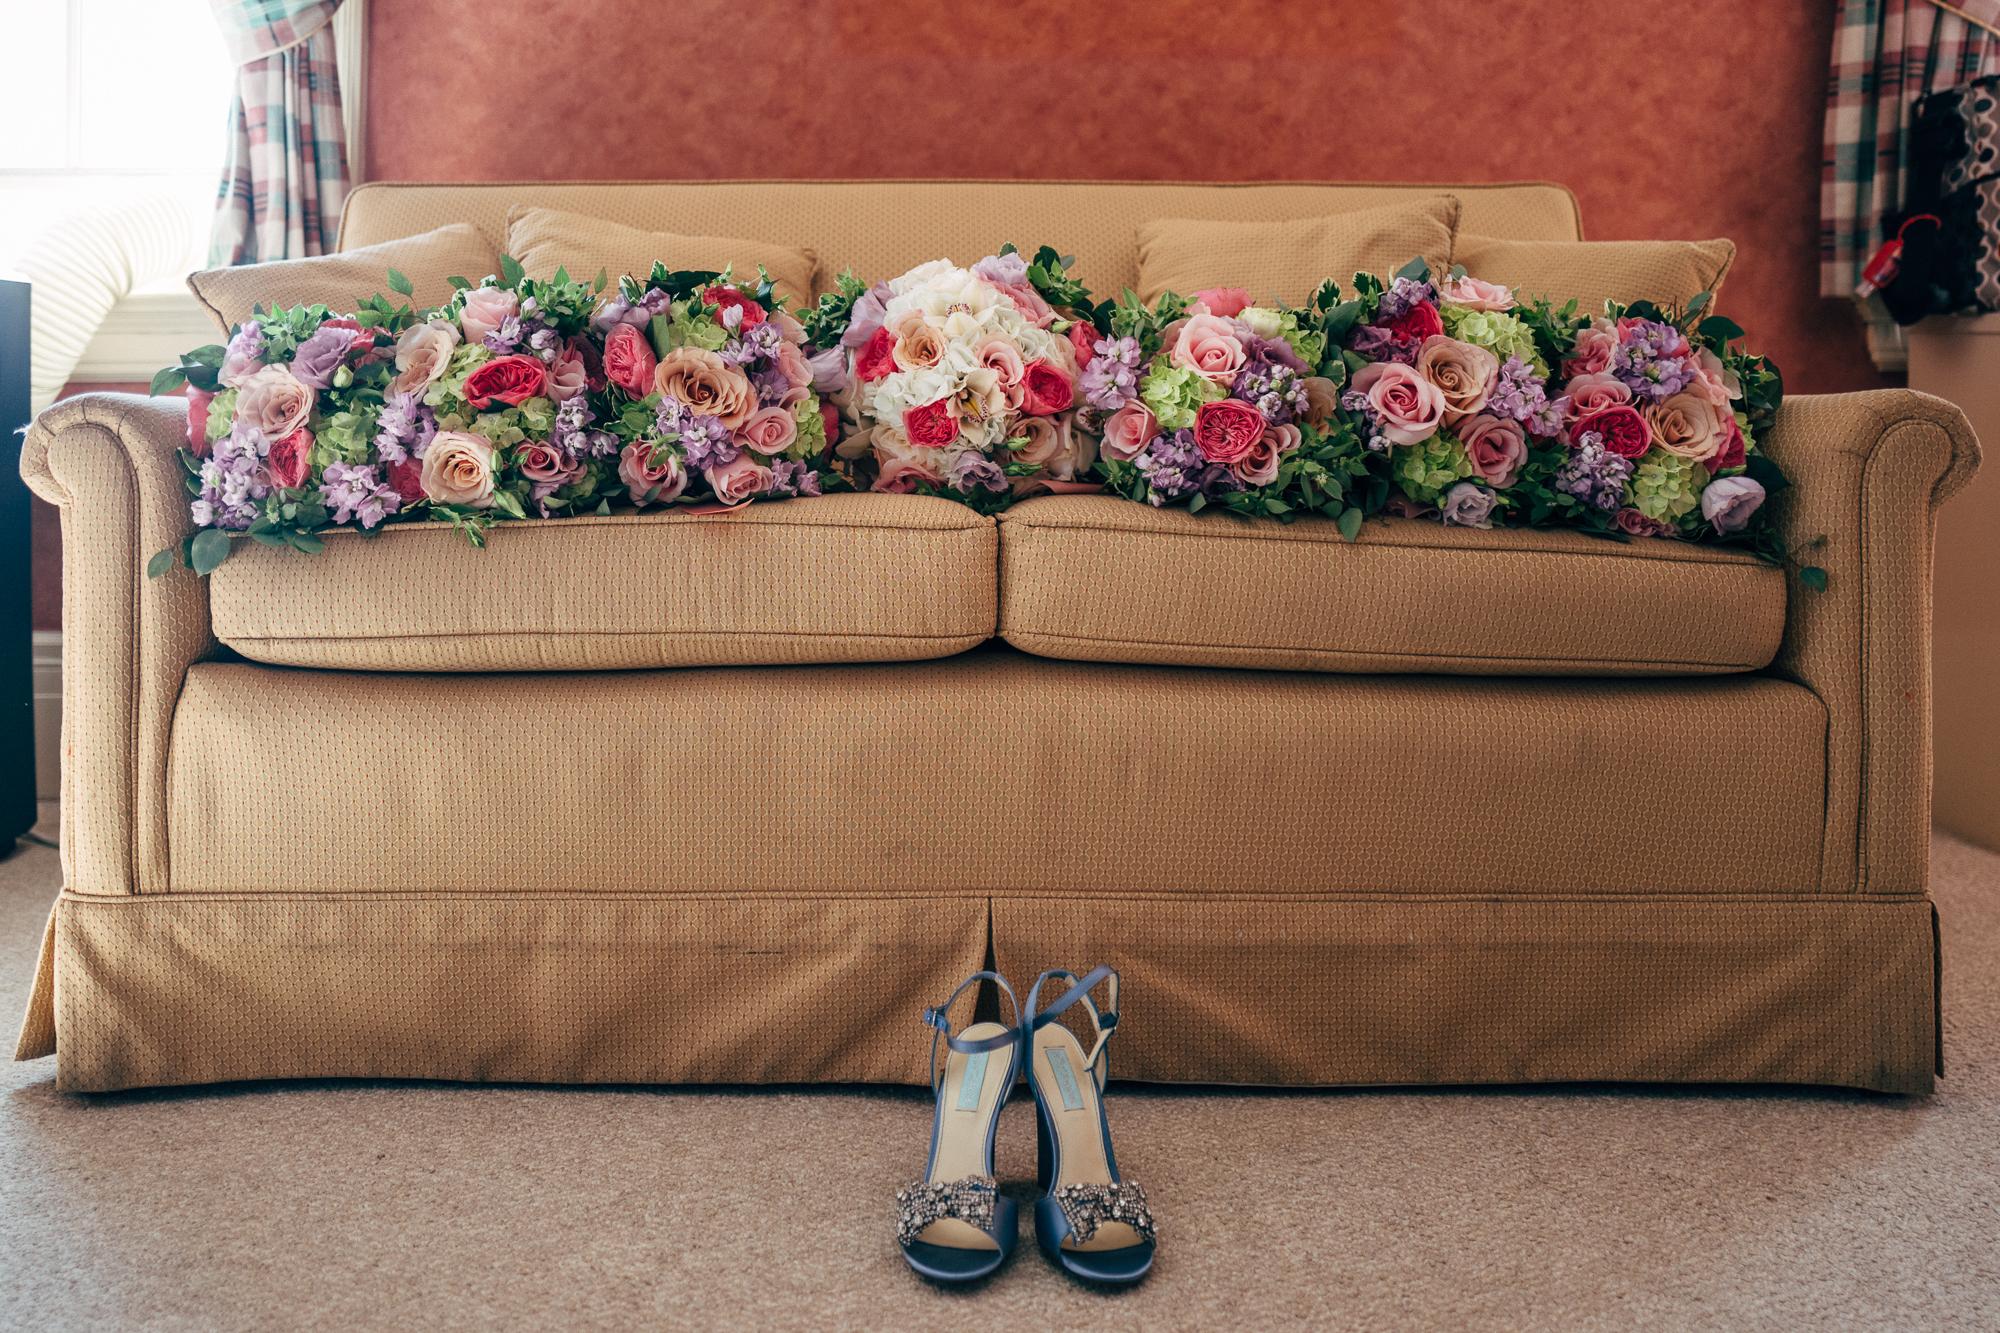 scranton-wedding-photography-zak-zavada-2016.06-rebeccaIan-0154.jpg